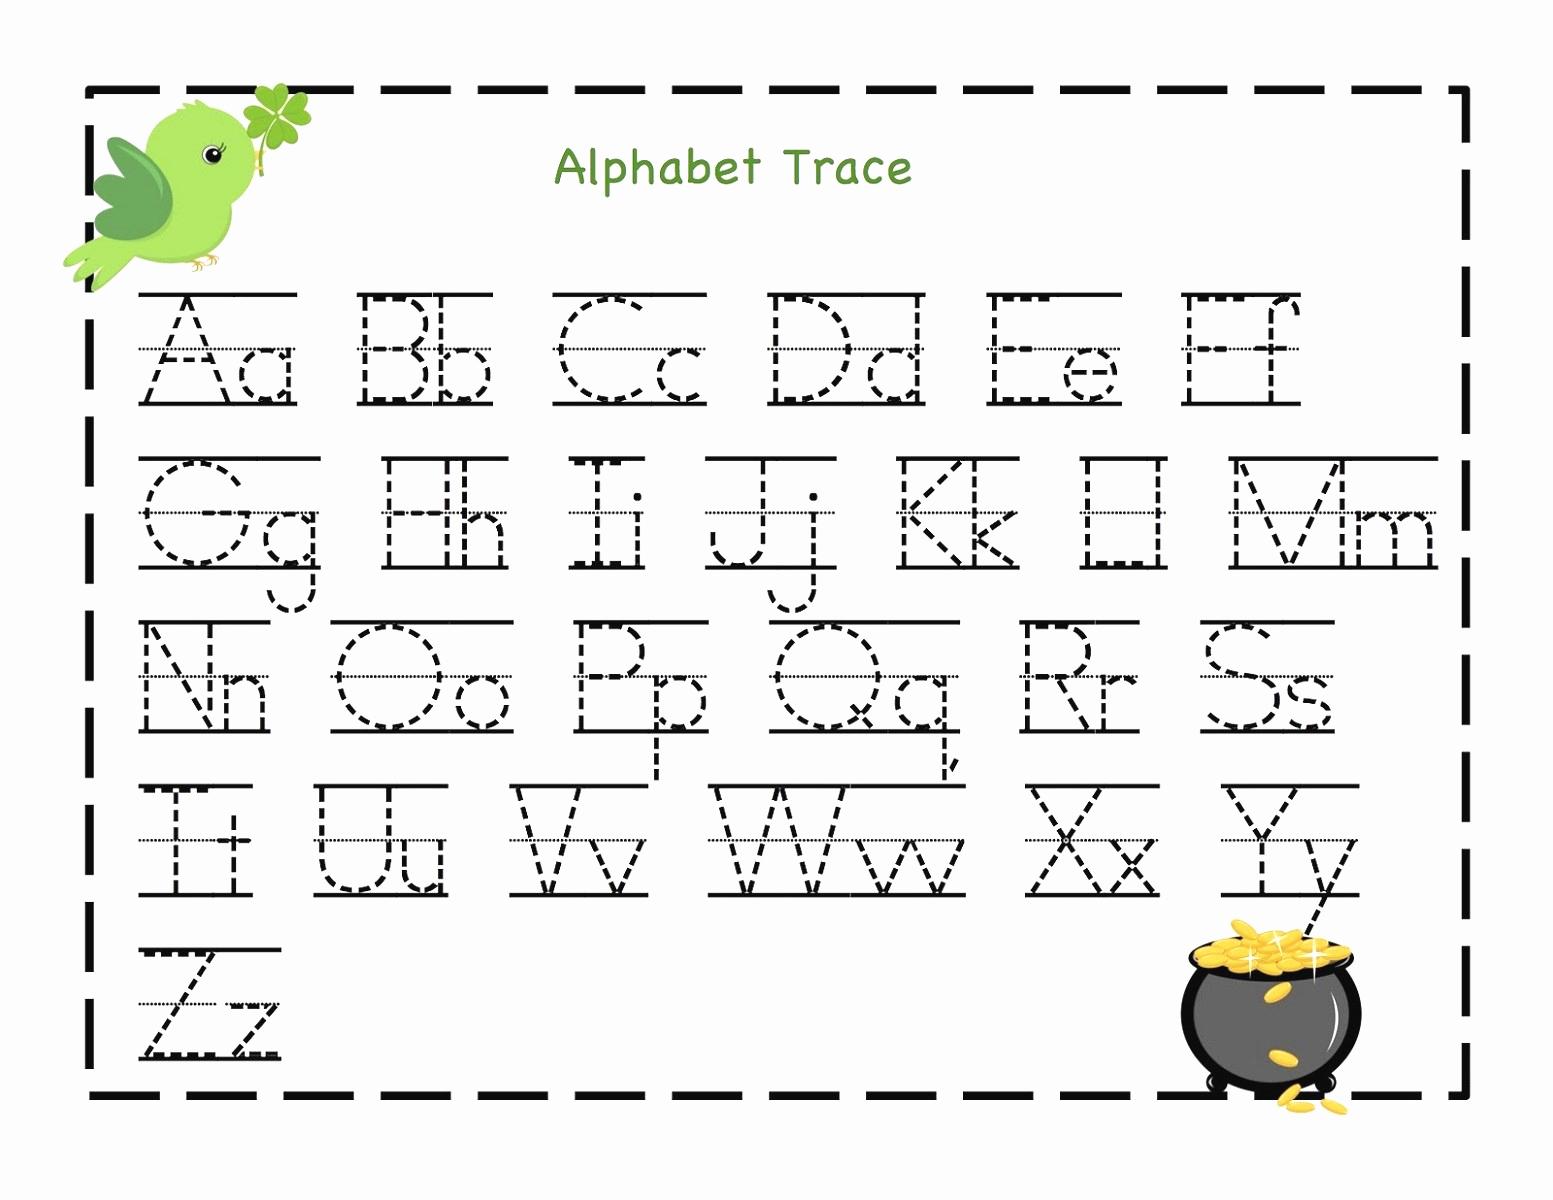 Free Printable Alphabetical order Worksheets Inspirational Alphabet order Worksheets Free